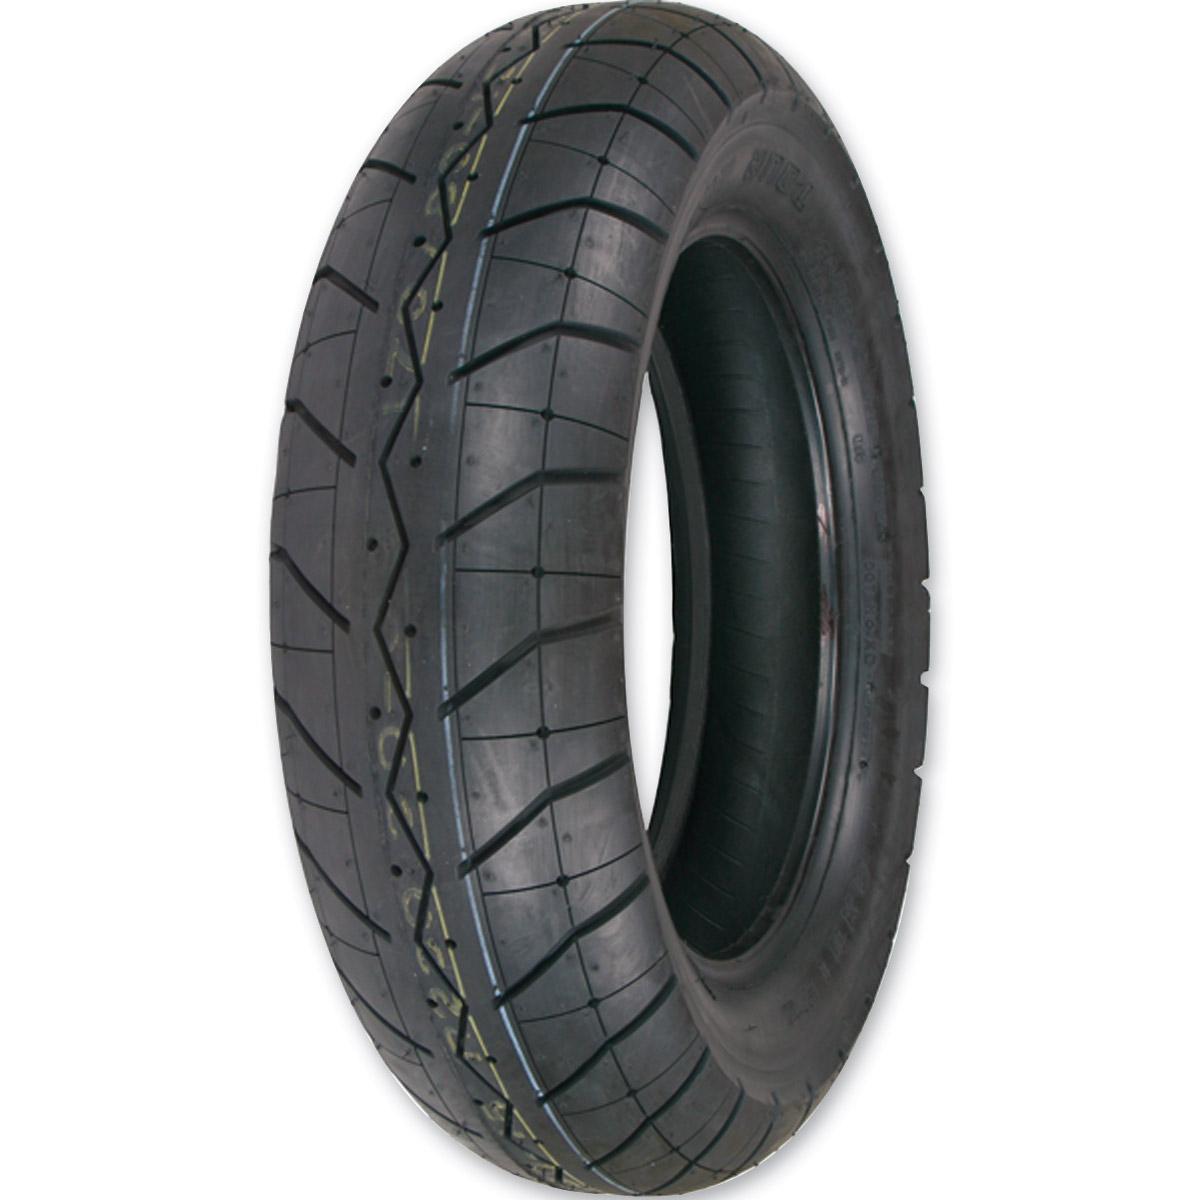 Motorcycle Rear Tire >> Shinko 230 Tour Master 180 70 15 Rear Tire Zz26861 J P Cycles